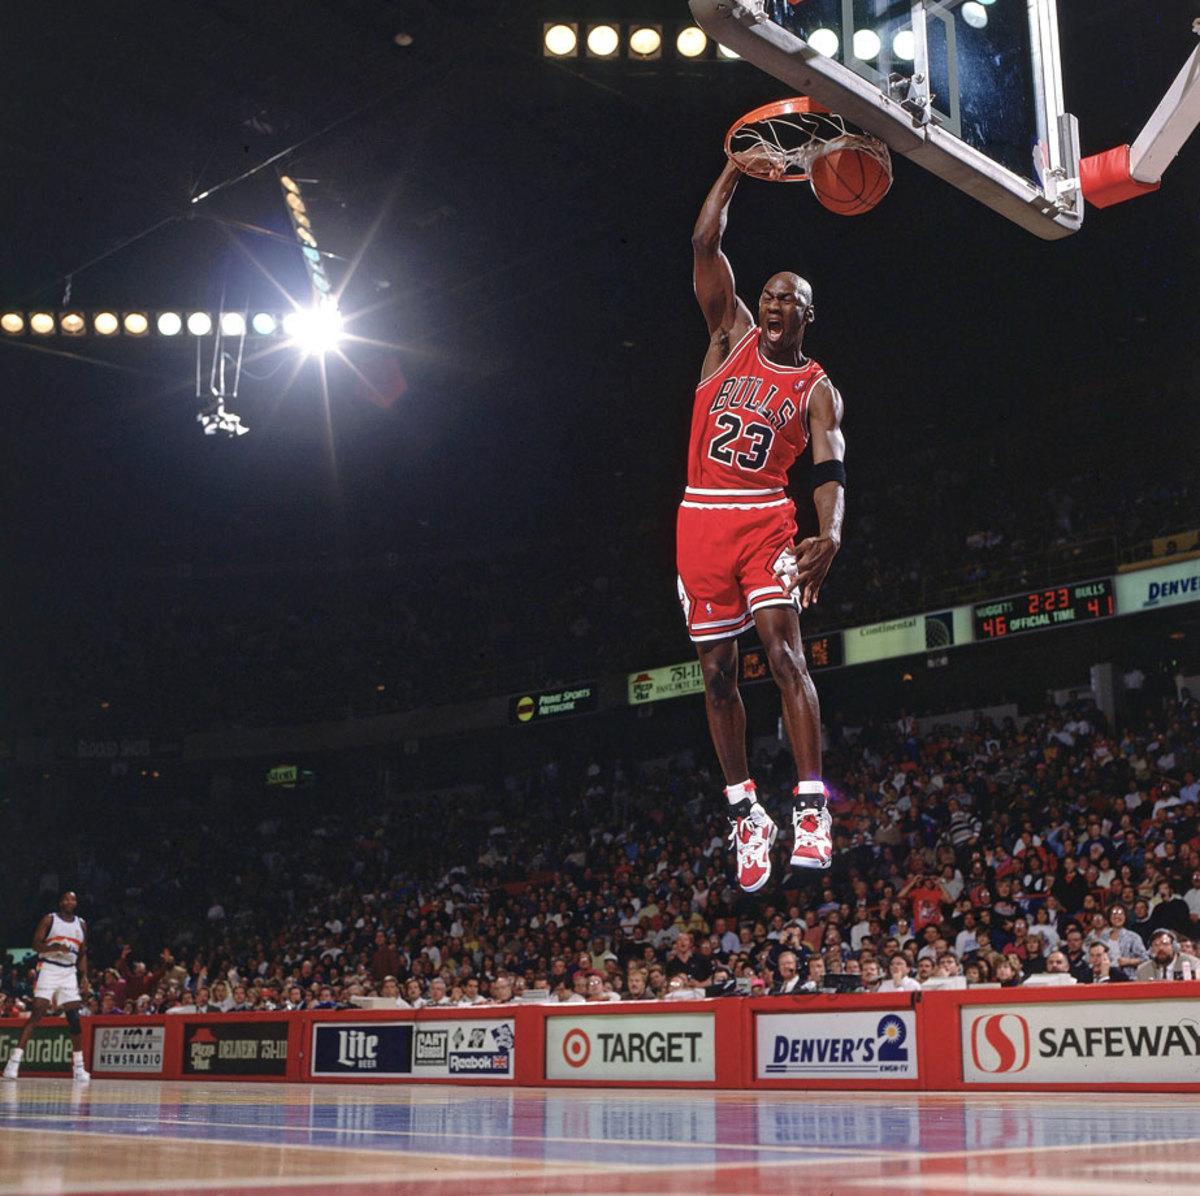 1991-Michael-Jordan-005010523final.jpg